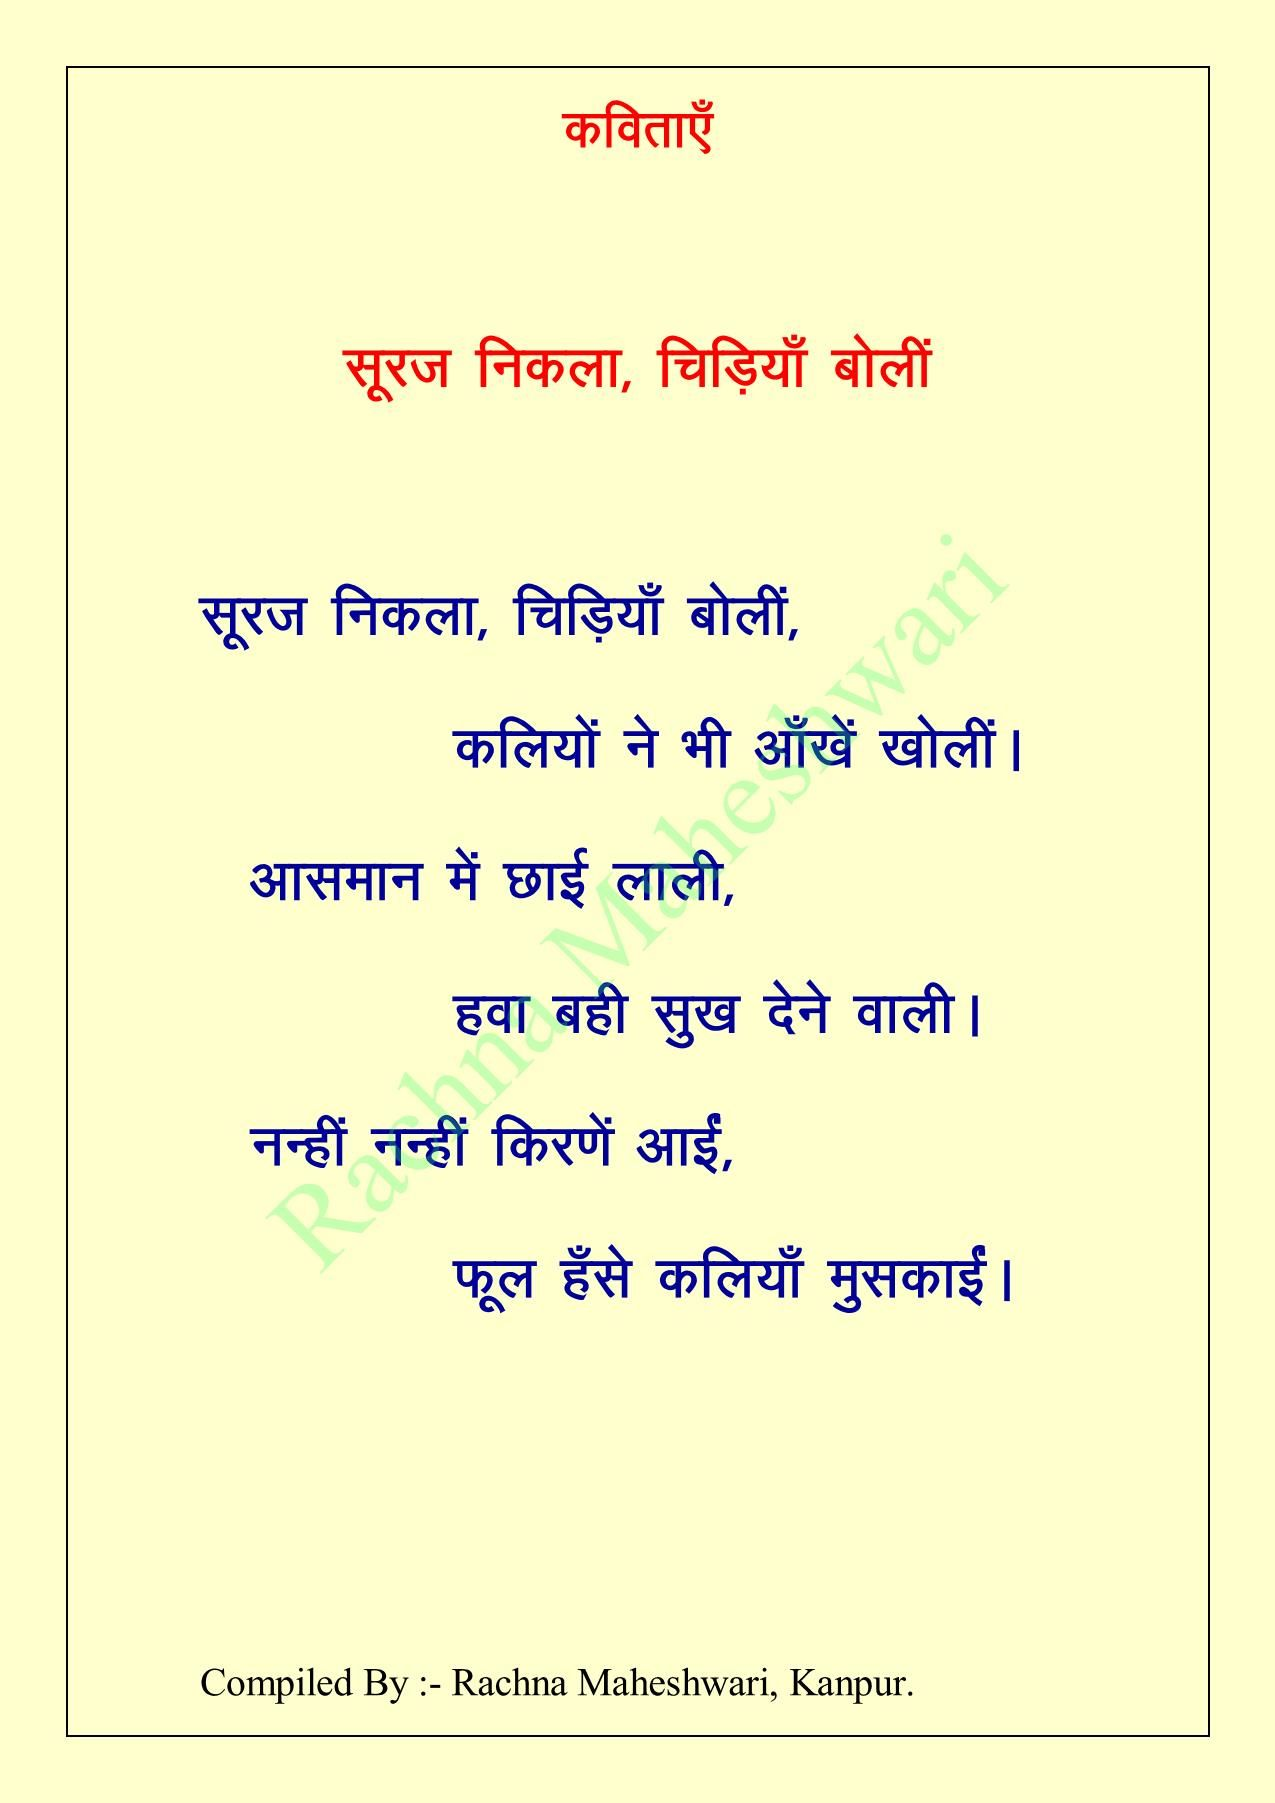 Pin by Priti Singh on Hindi for kids | Pinterest | Handwriting ...